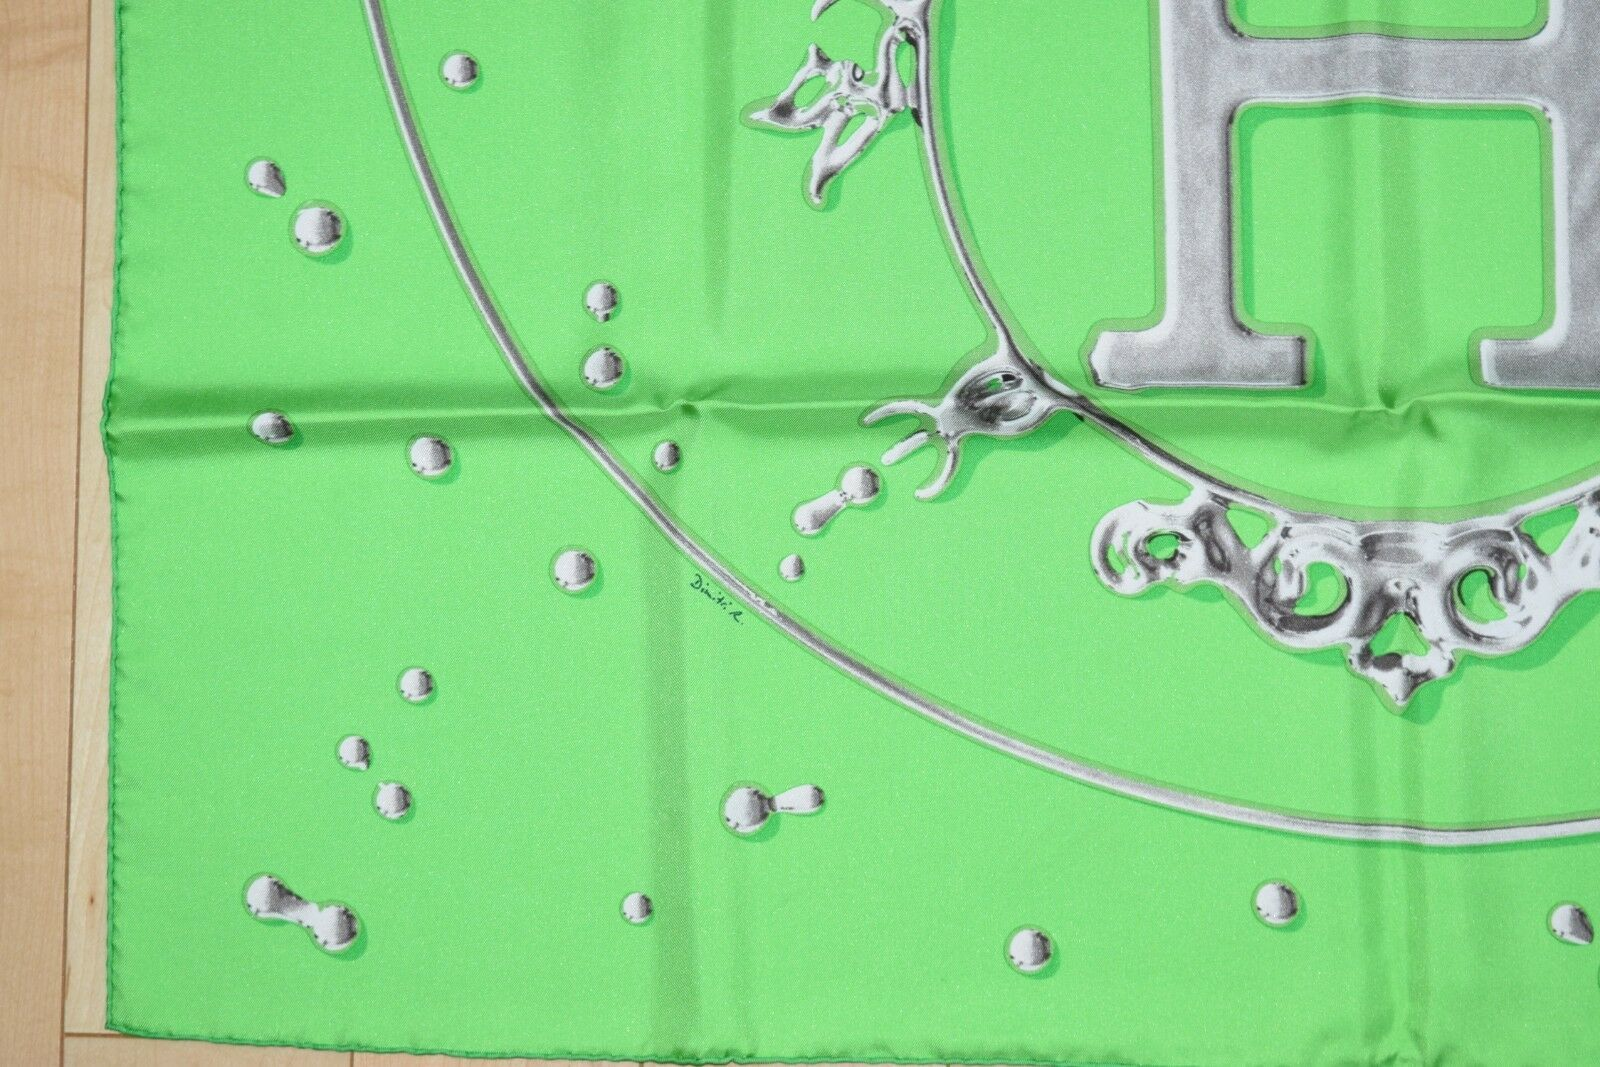 Hermes Scarf Vif Argent by Dimitri Rybaltchenko 90 cm Silk Green Carre Shawl